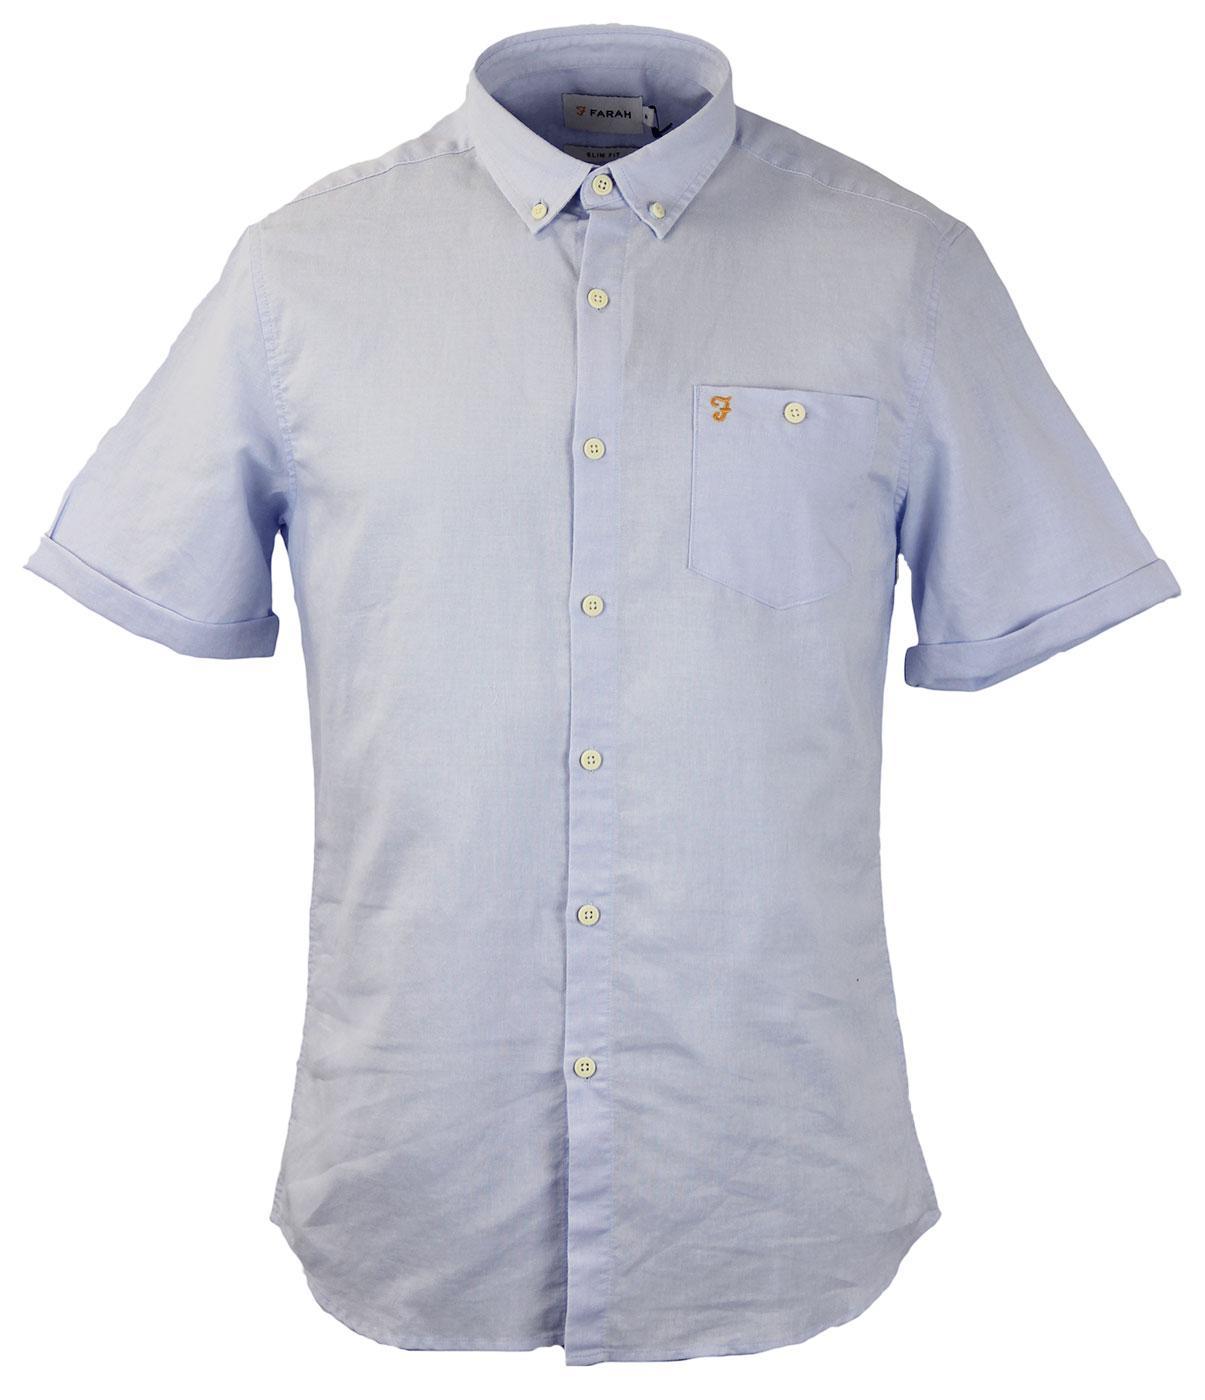 FARAH VINTAGE Trent Retro Mod S S Button Down Ramie Shirt Ice Cap 0bb421ba6